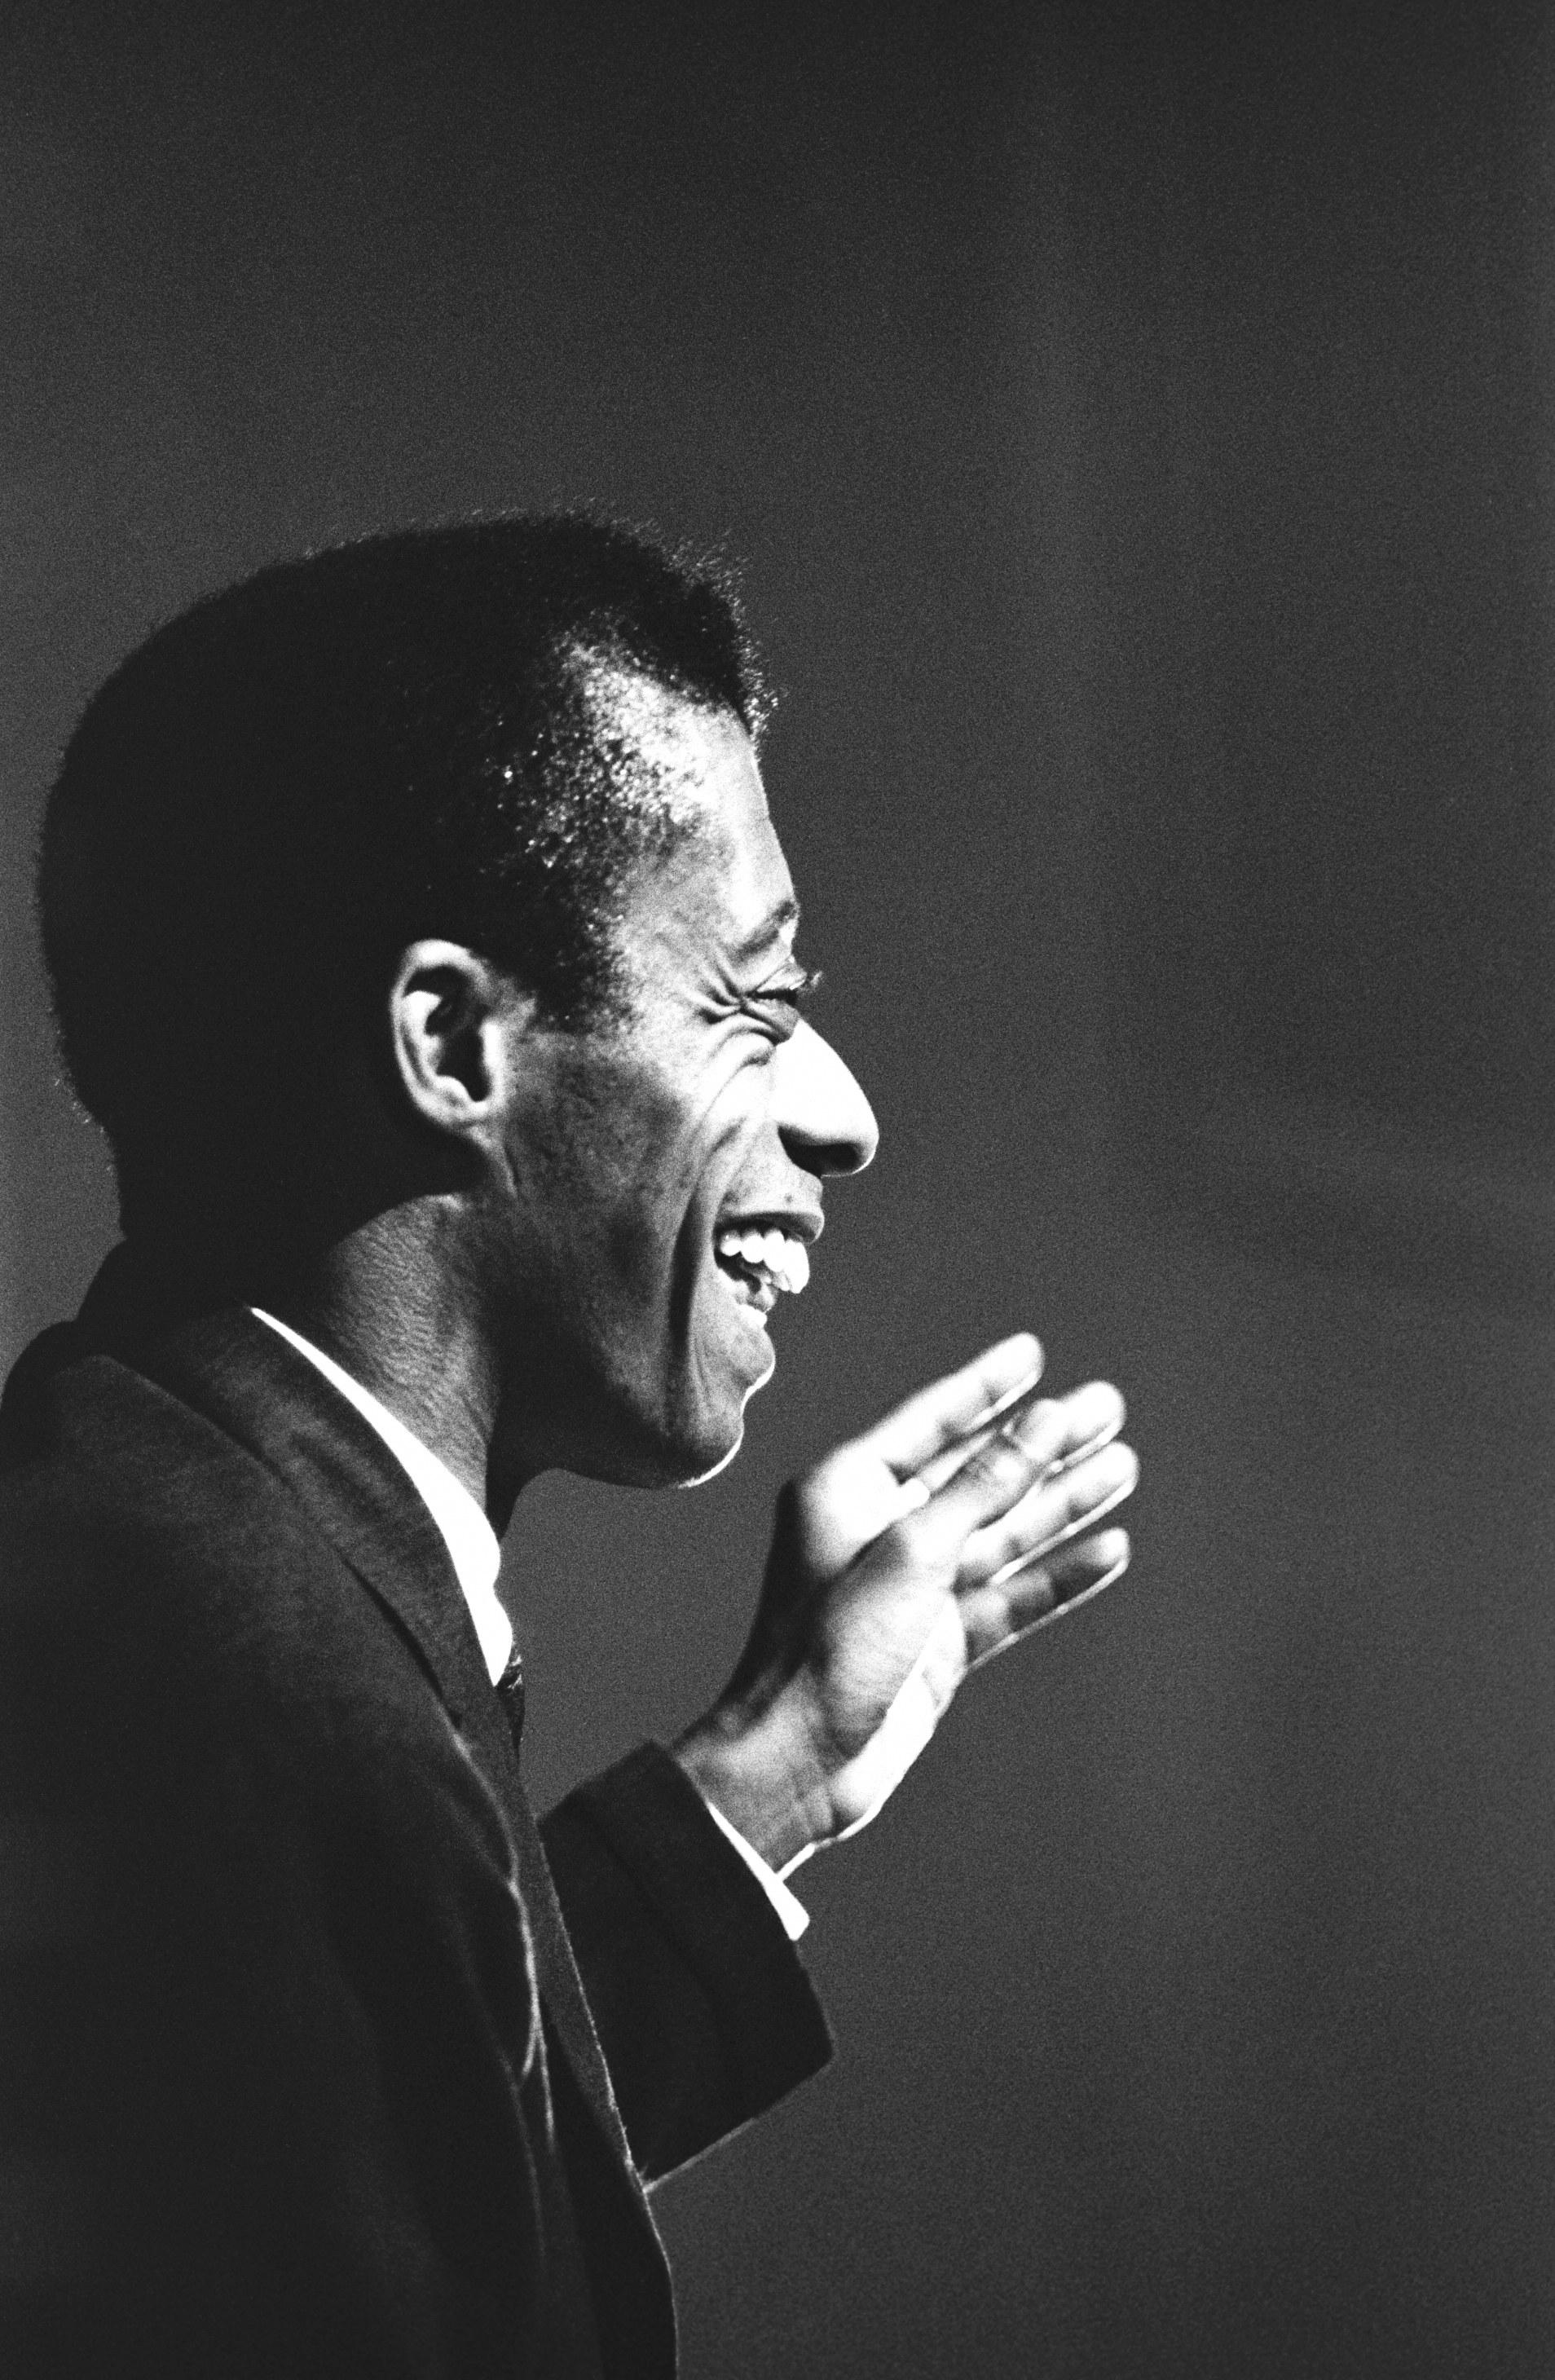 African American Author, African American Writer, African American Books, Black Books, Civil Rights Activist, James Baldwin, KOLUMN Magazine, KOLUMN